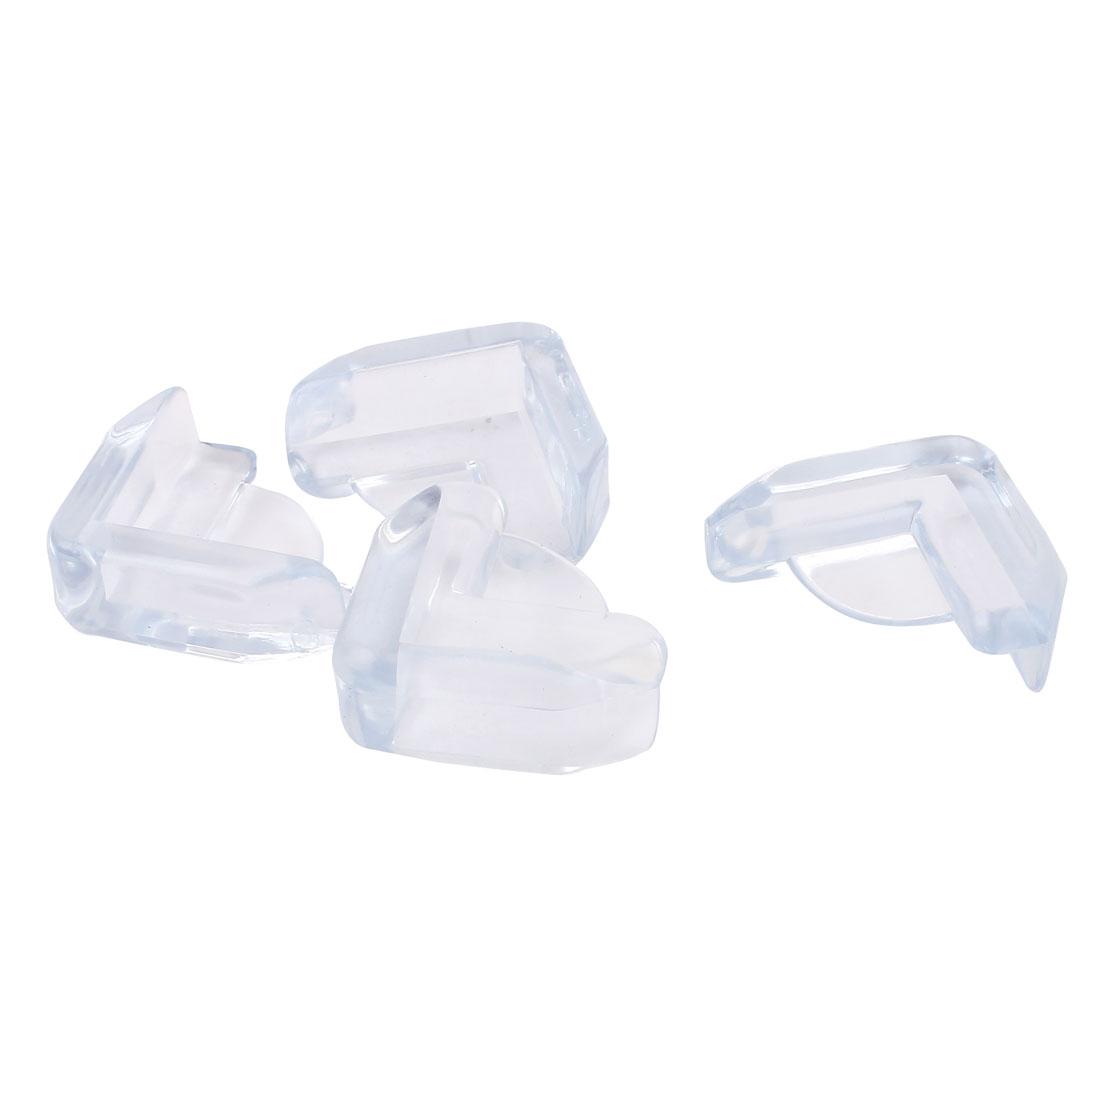 Clear Blue Plastic Triangle Desk Table Corner Cushion Safety Pad Mat 4 Pcs